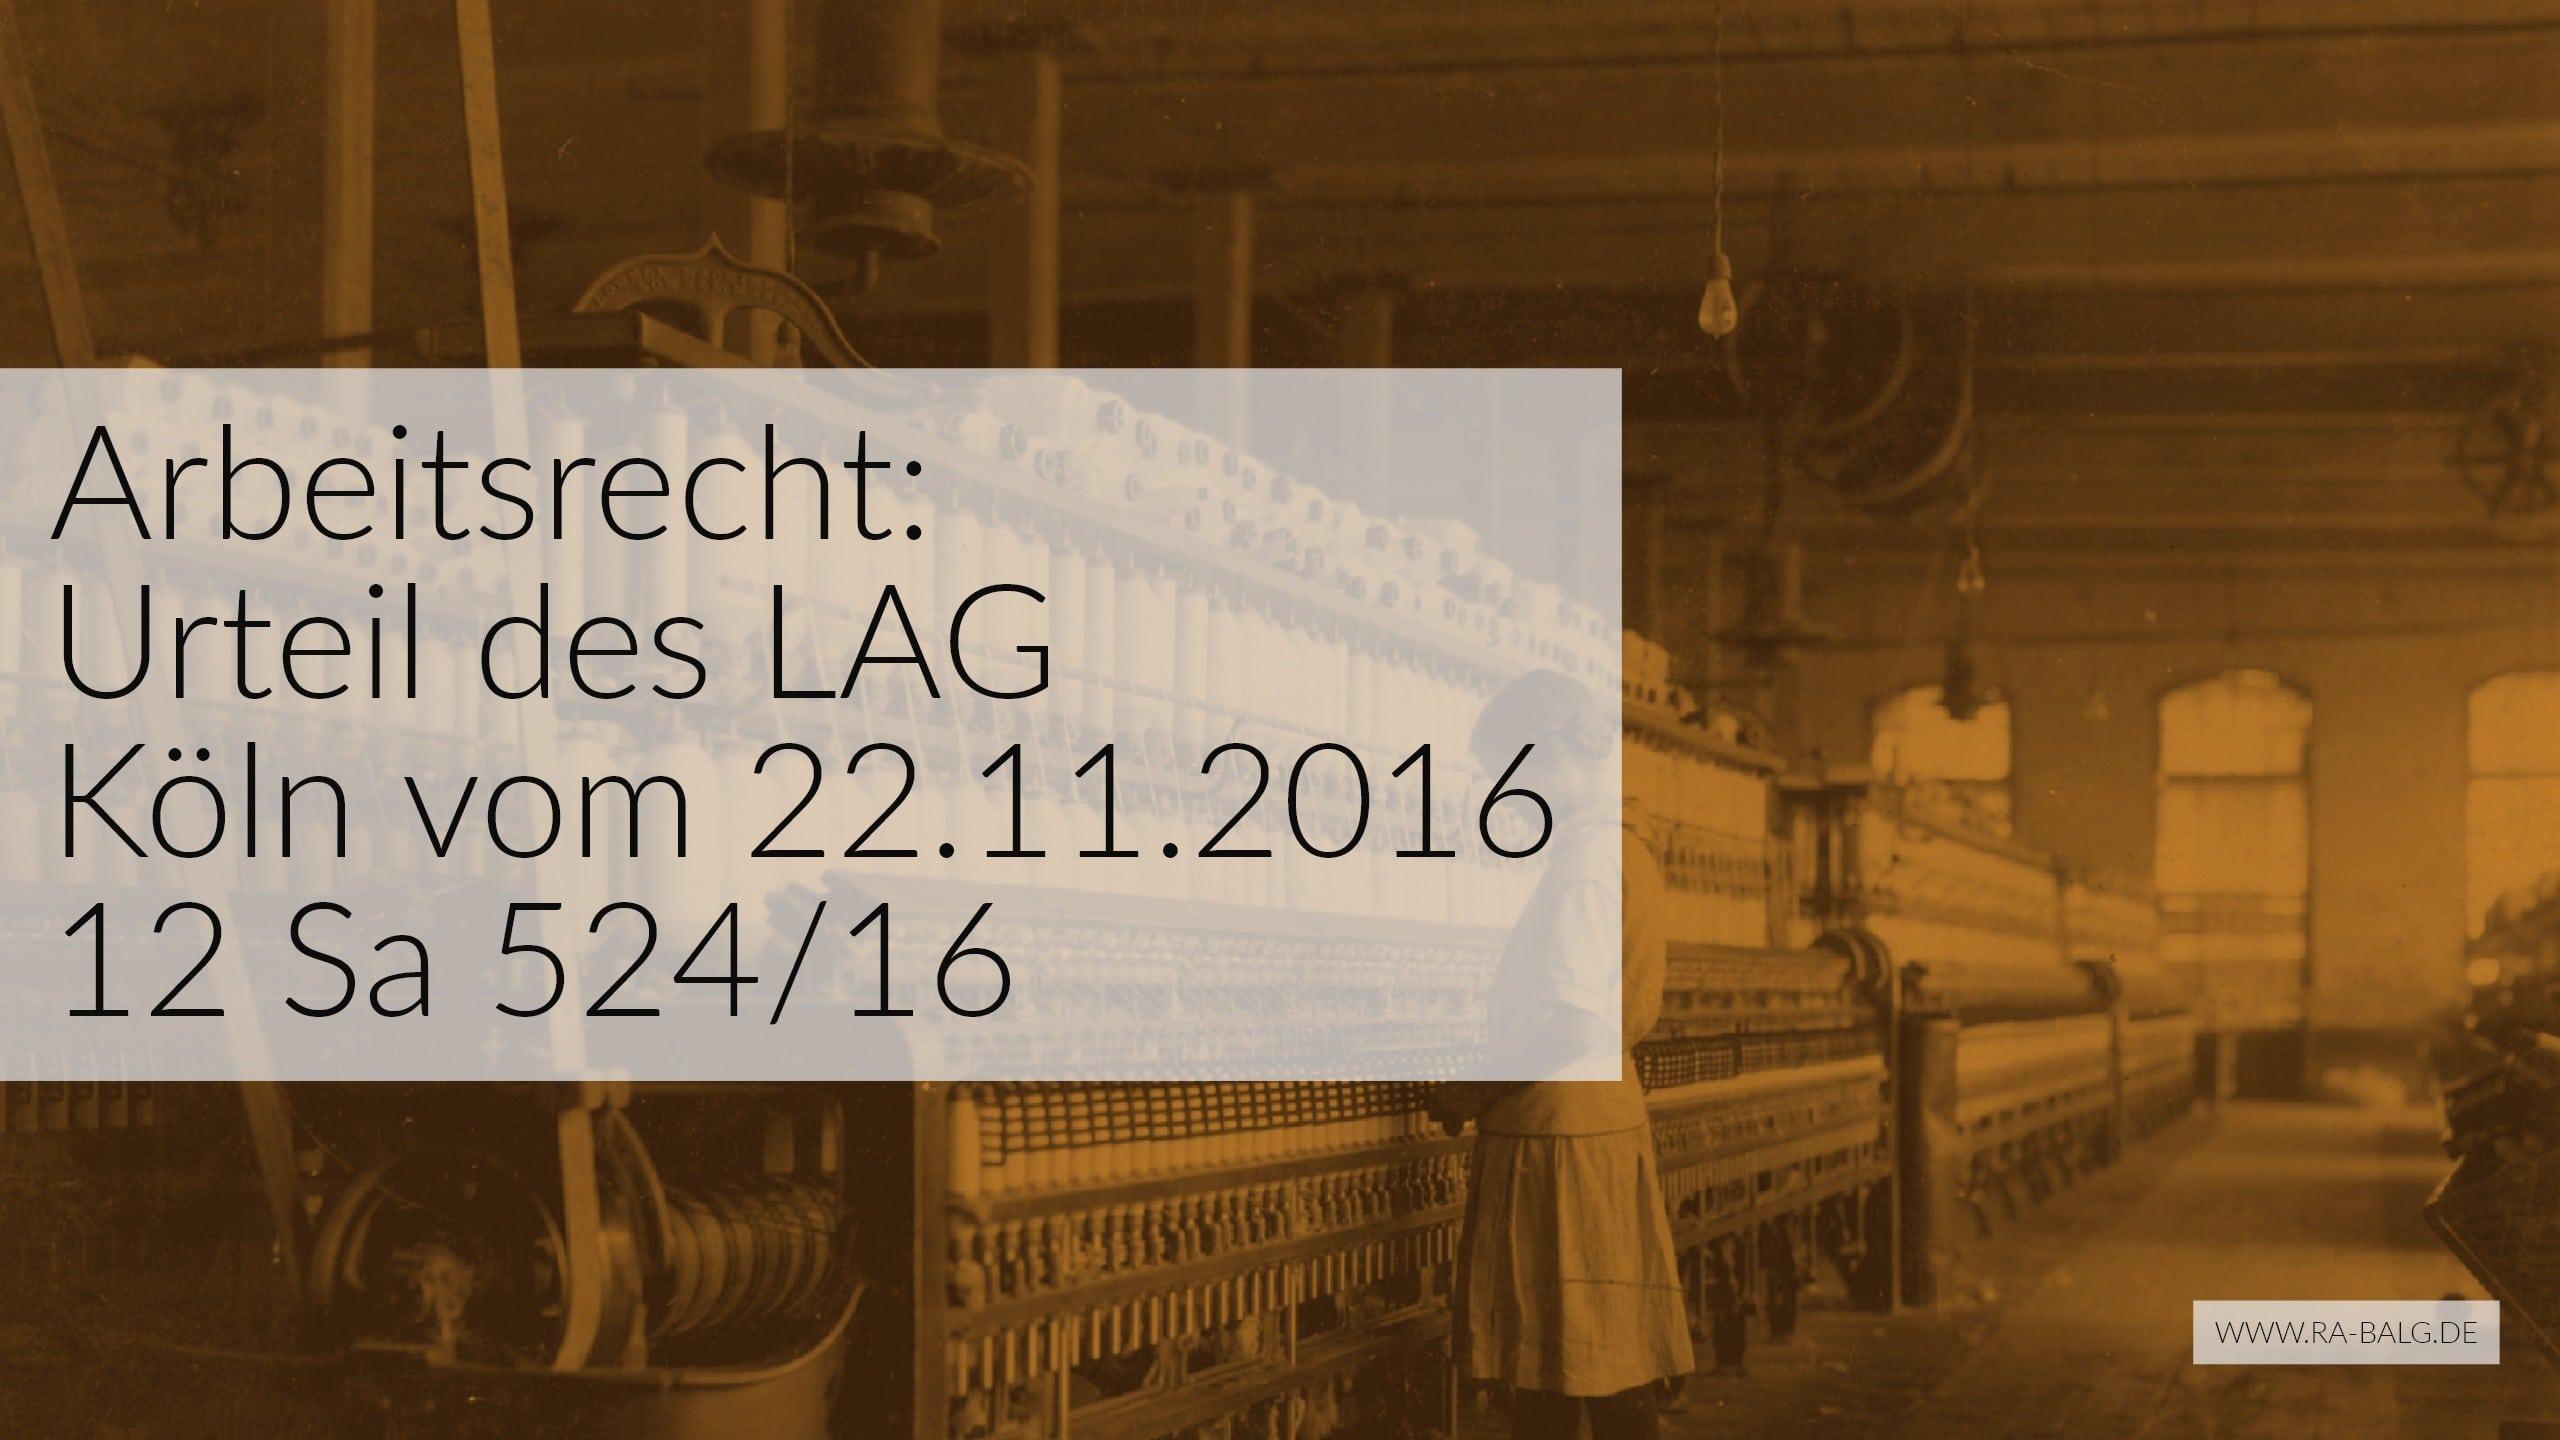 Arbeitsrecht - Unpünktliche Gehaltszahlung Schadensersatz - LAG Köln vom 22-11-2016 Az. 12 Sa 524-16 - Rechtsanwalt Köln Nippes